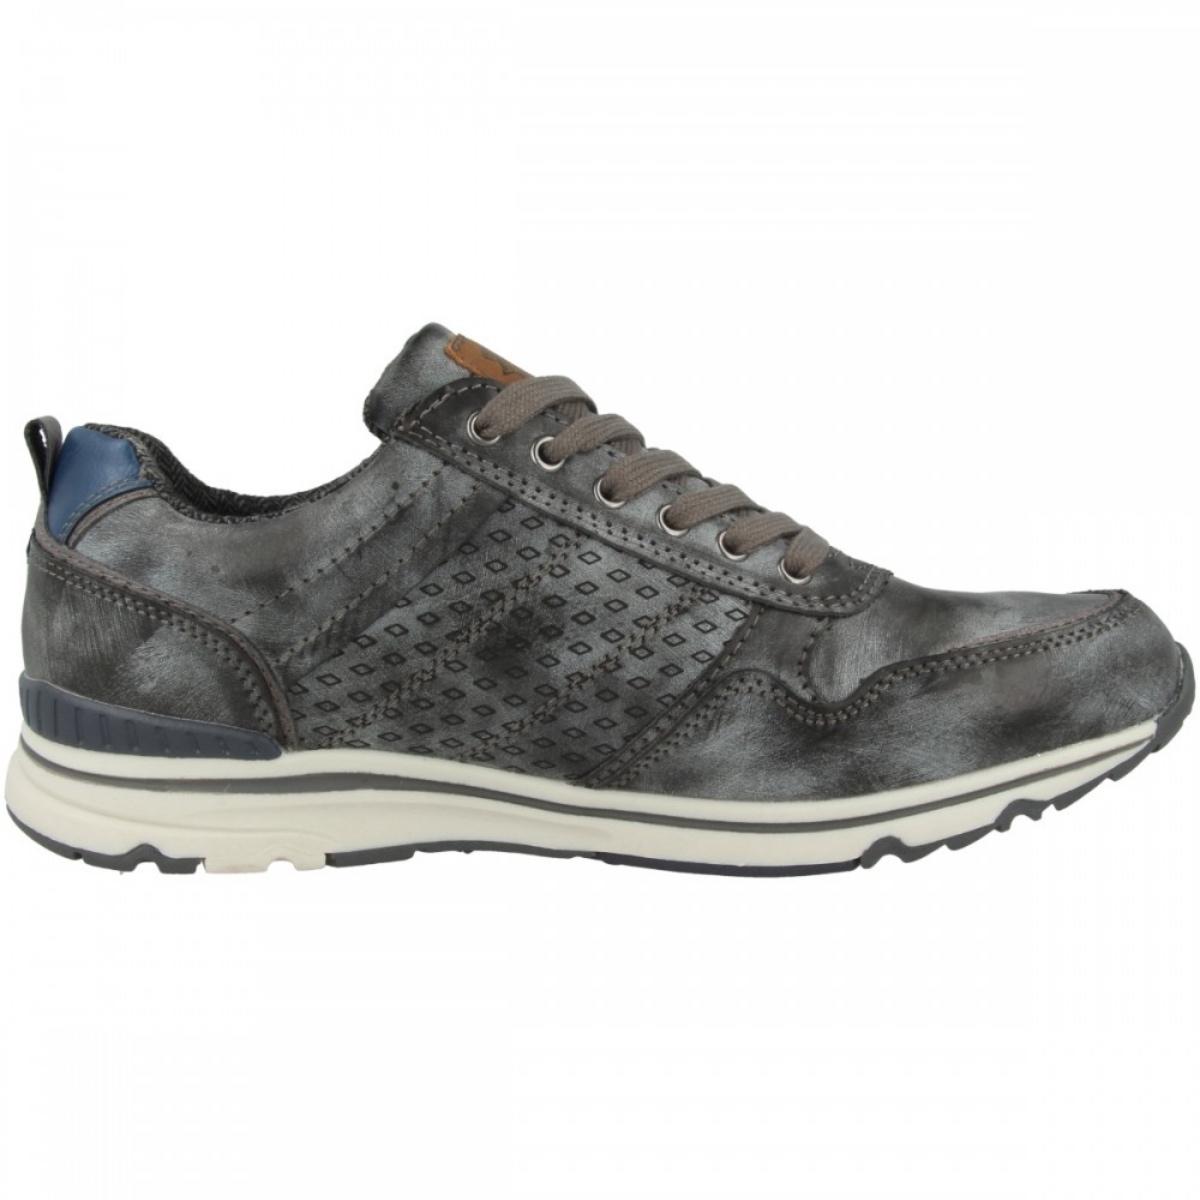 Dockers by Gerli Herren 42MO007 600100 Sneakers Schuhe